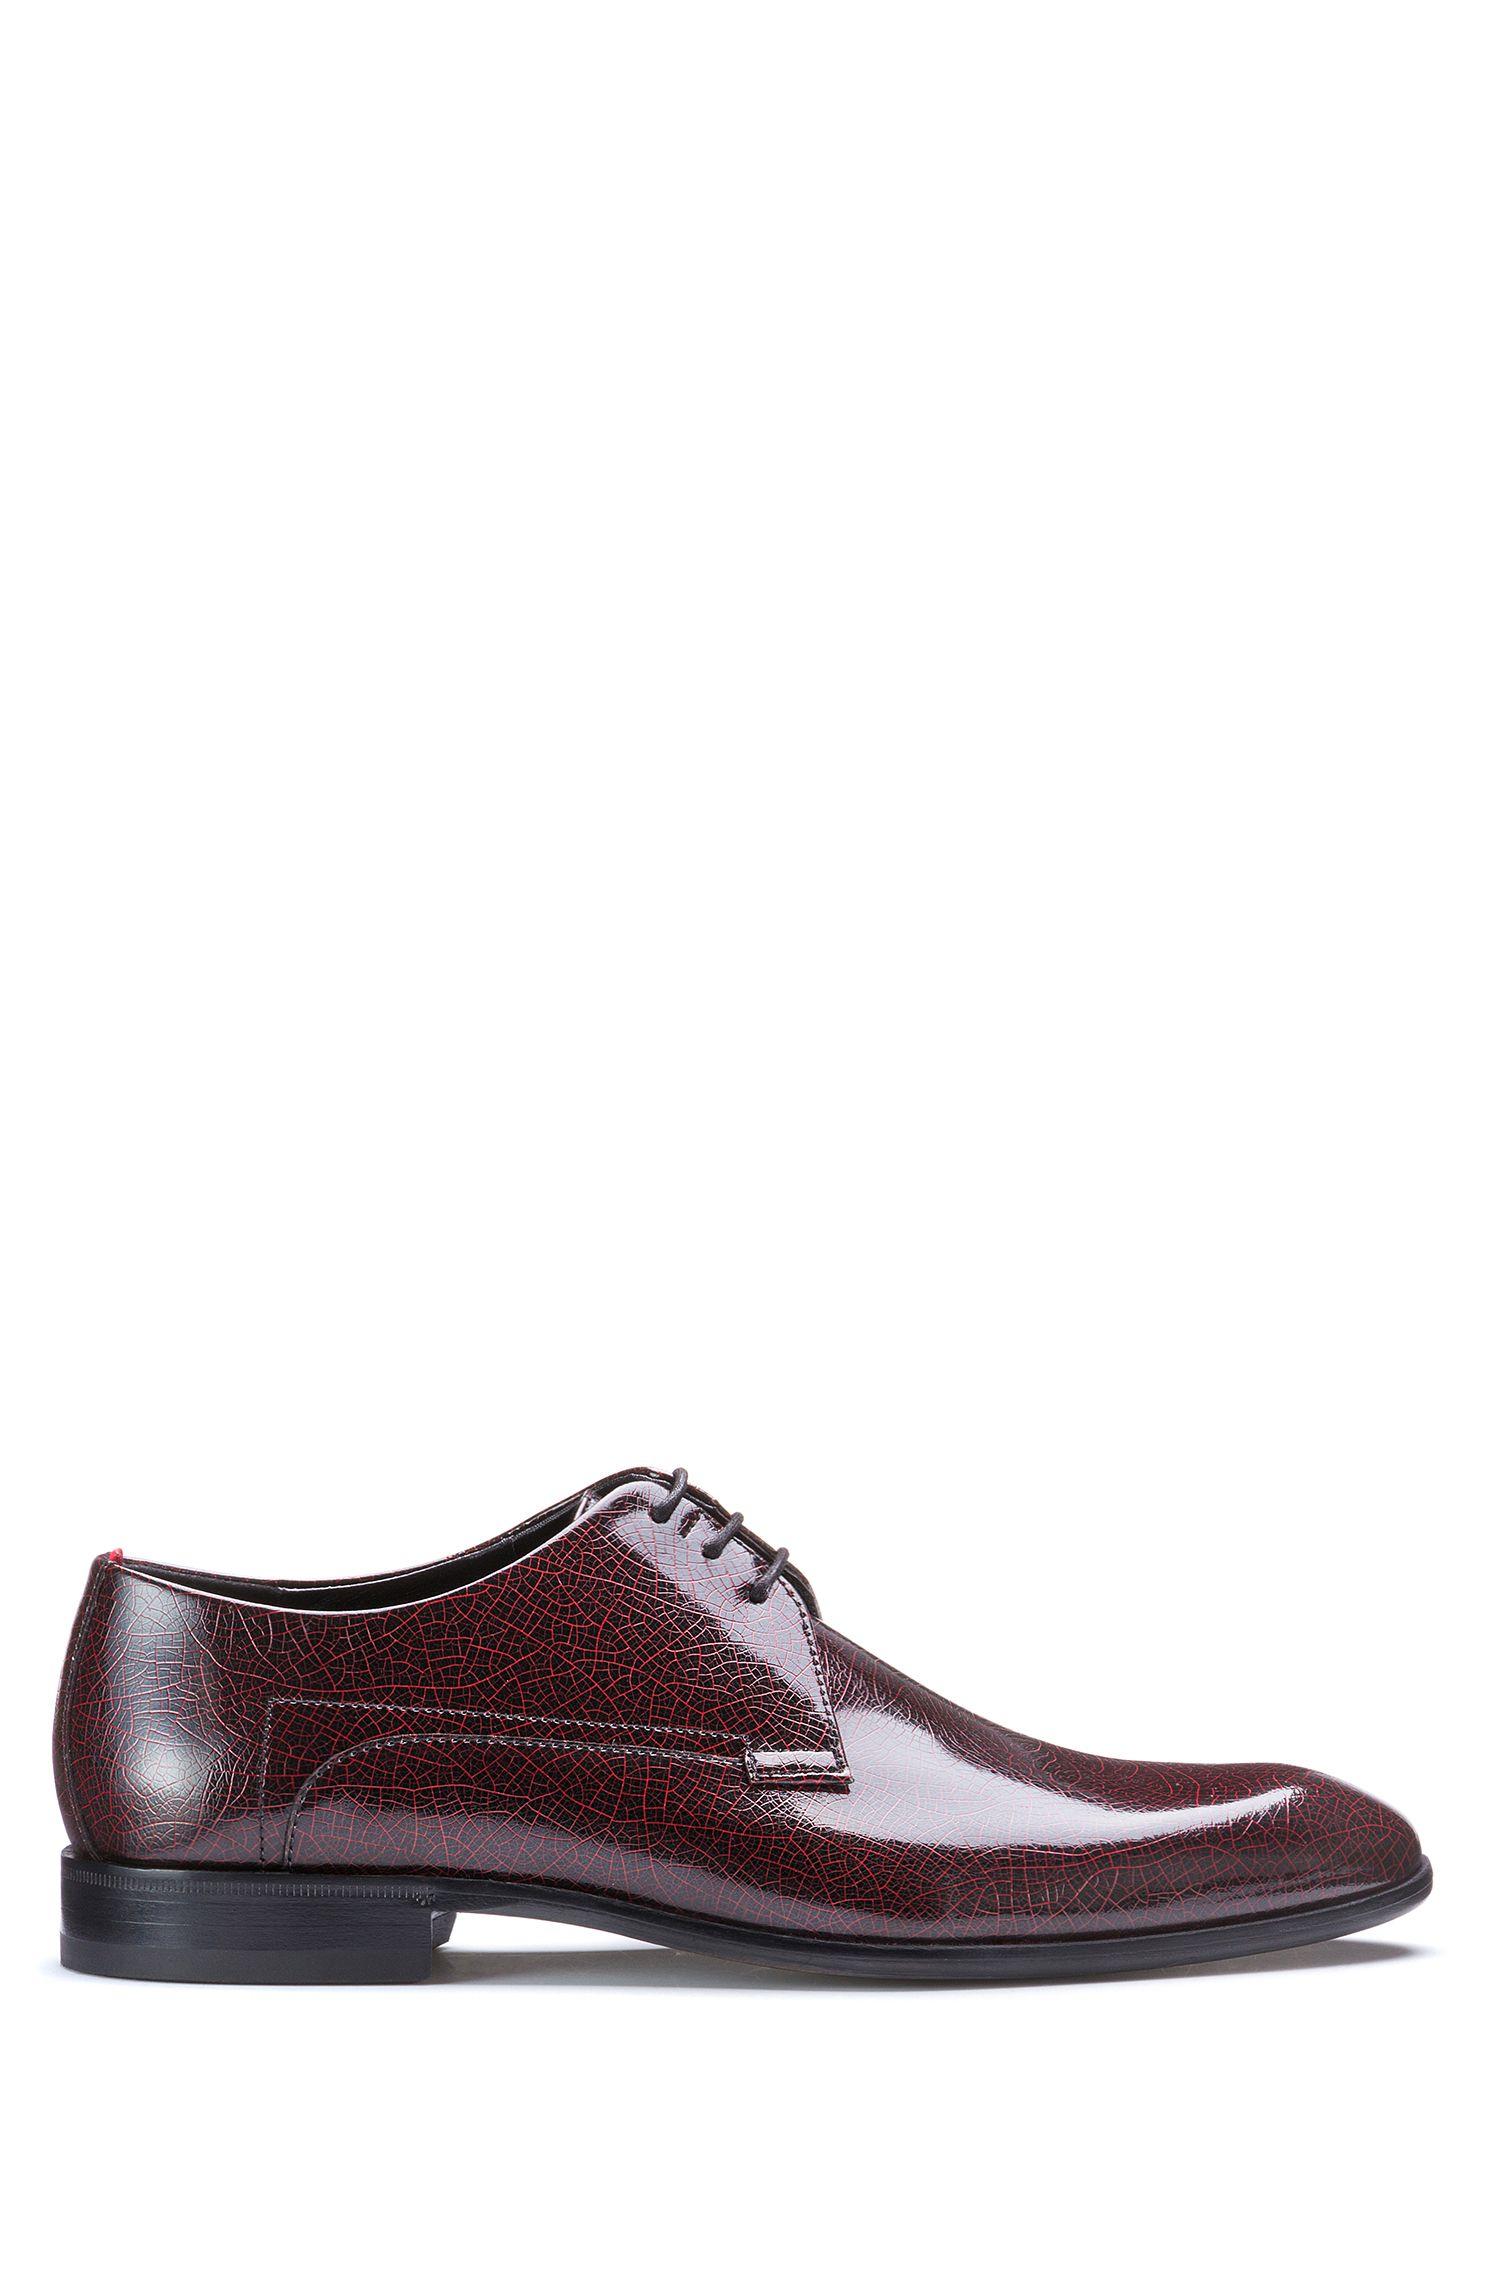 Italian Leather Derby Dress Shoe | Appeal Derb Pacr, Dark Red